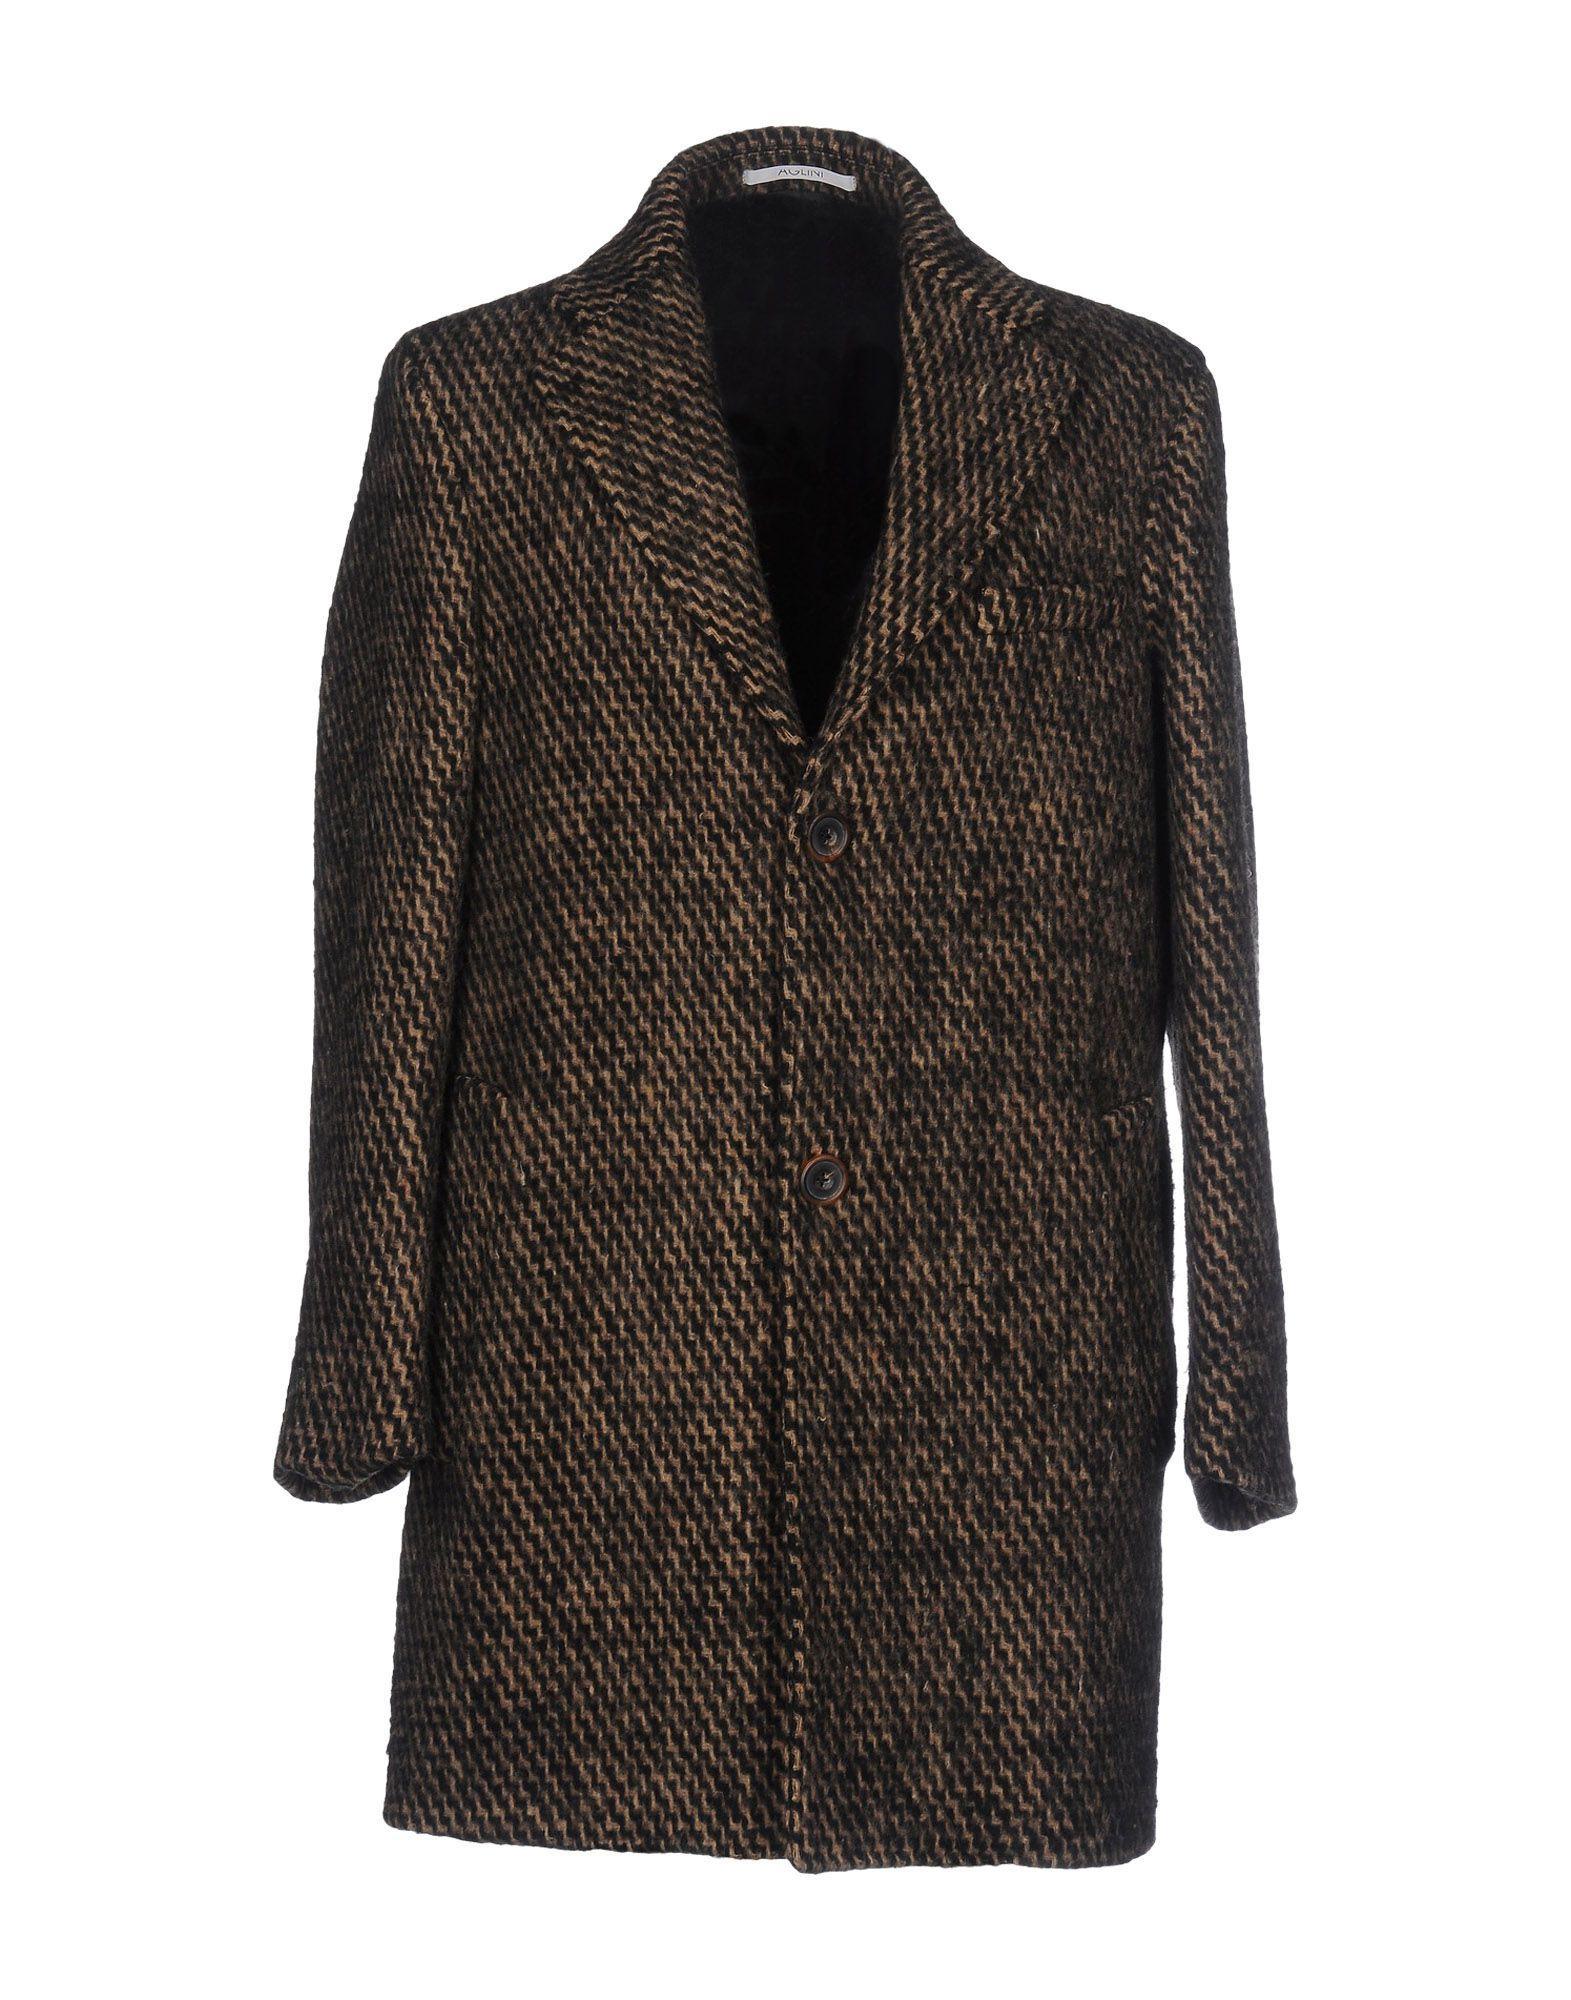 Aglini Coats In Khaki